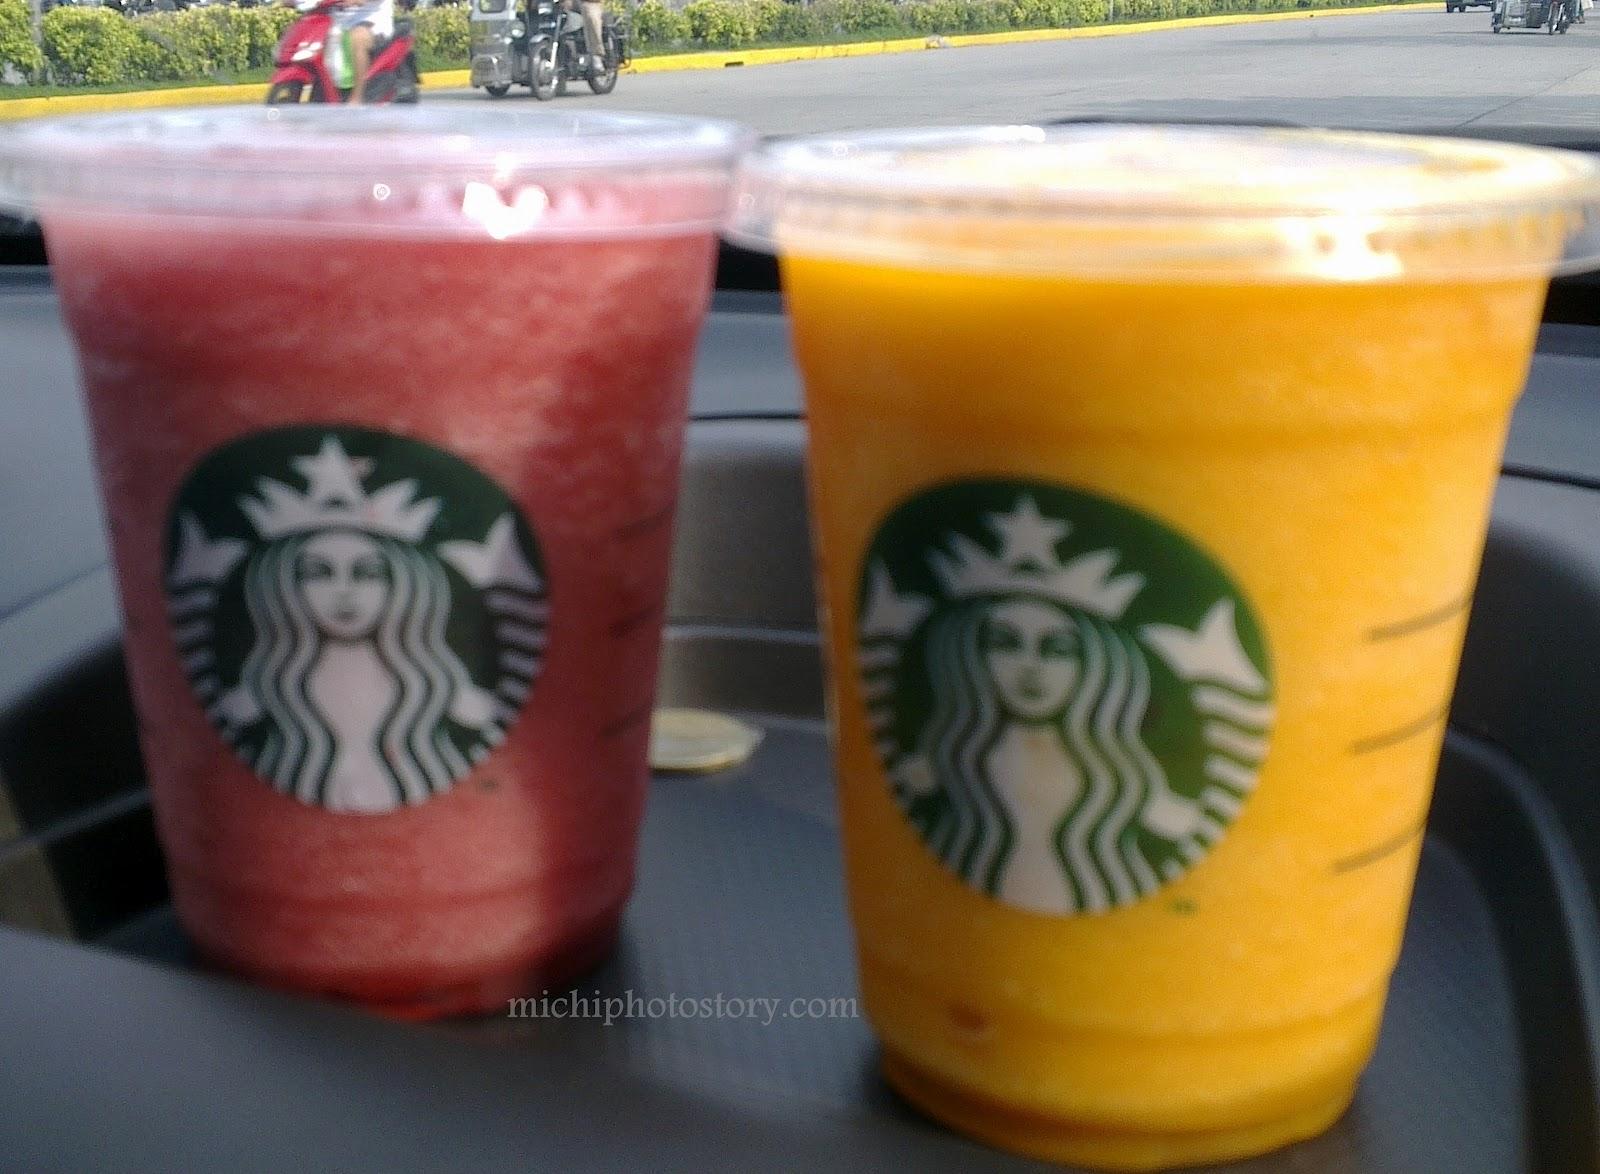 Michi Photostory: Free Starbucks Beverage